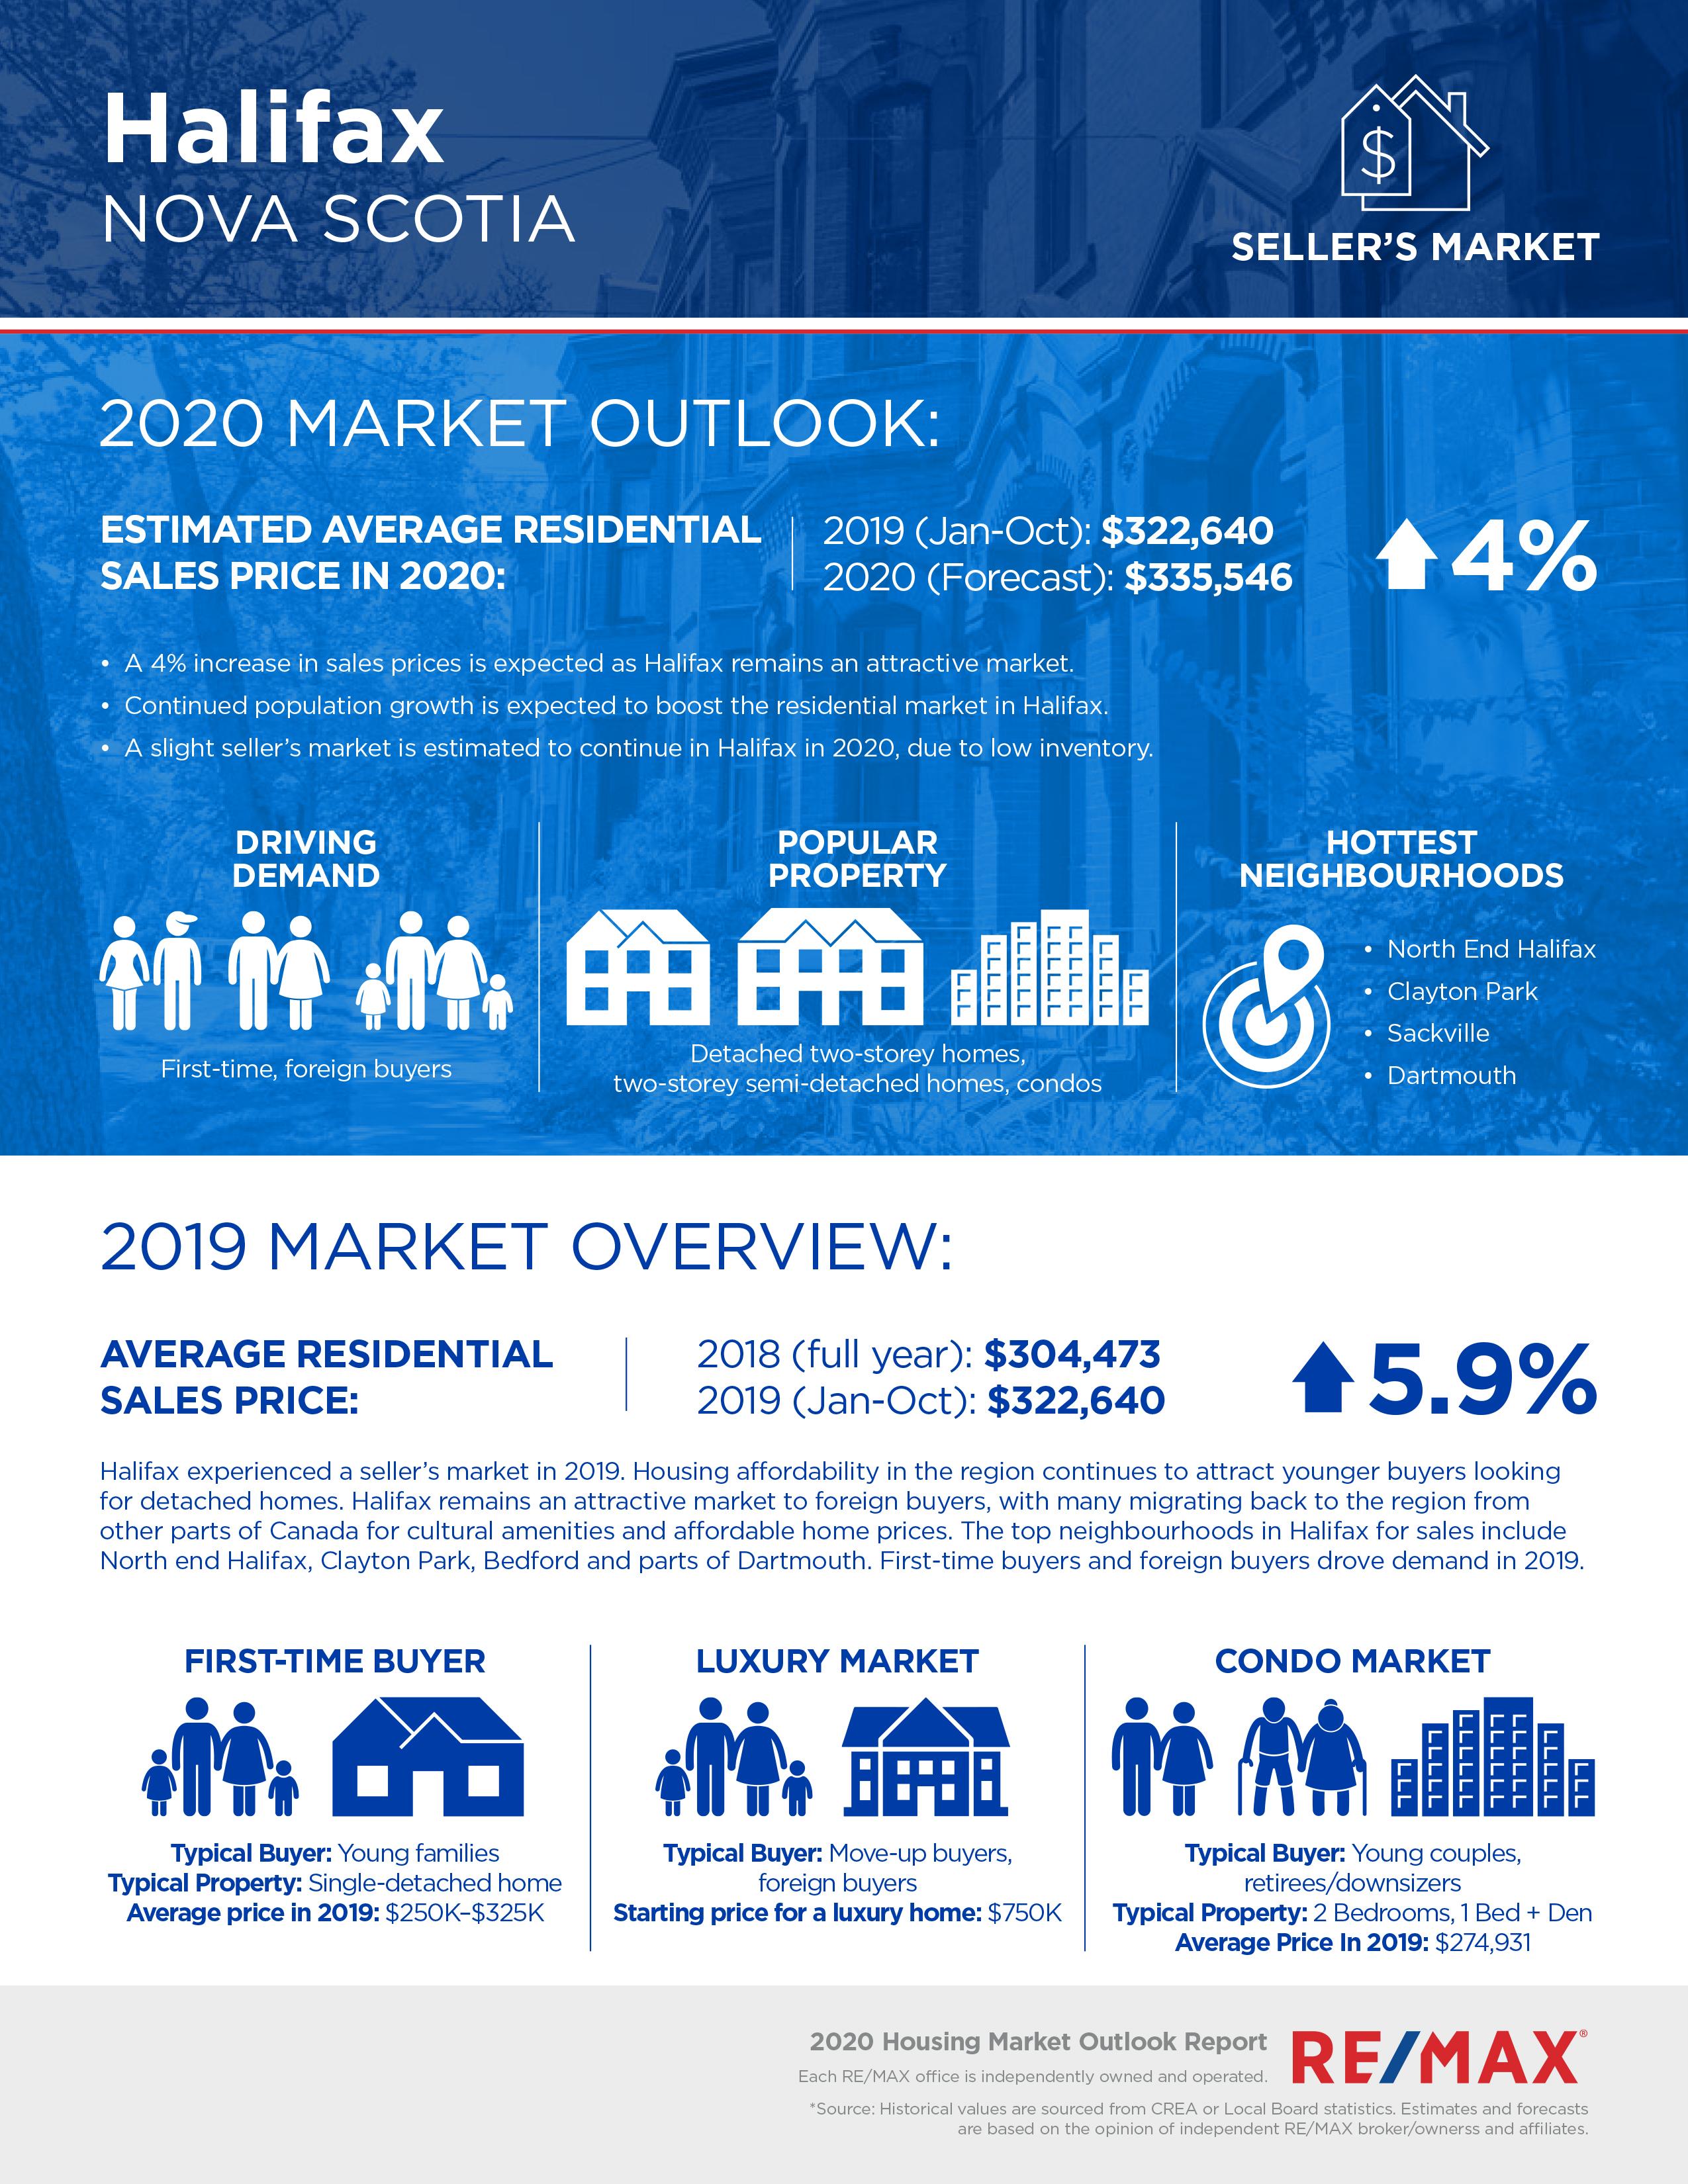 Halifax housing market report